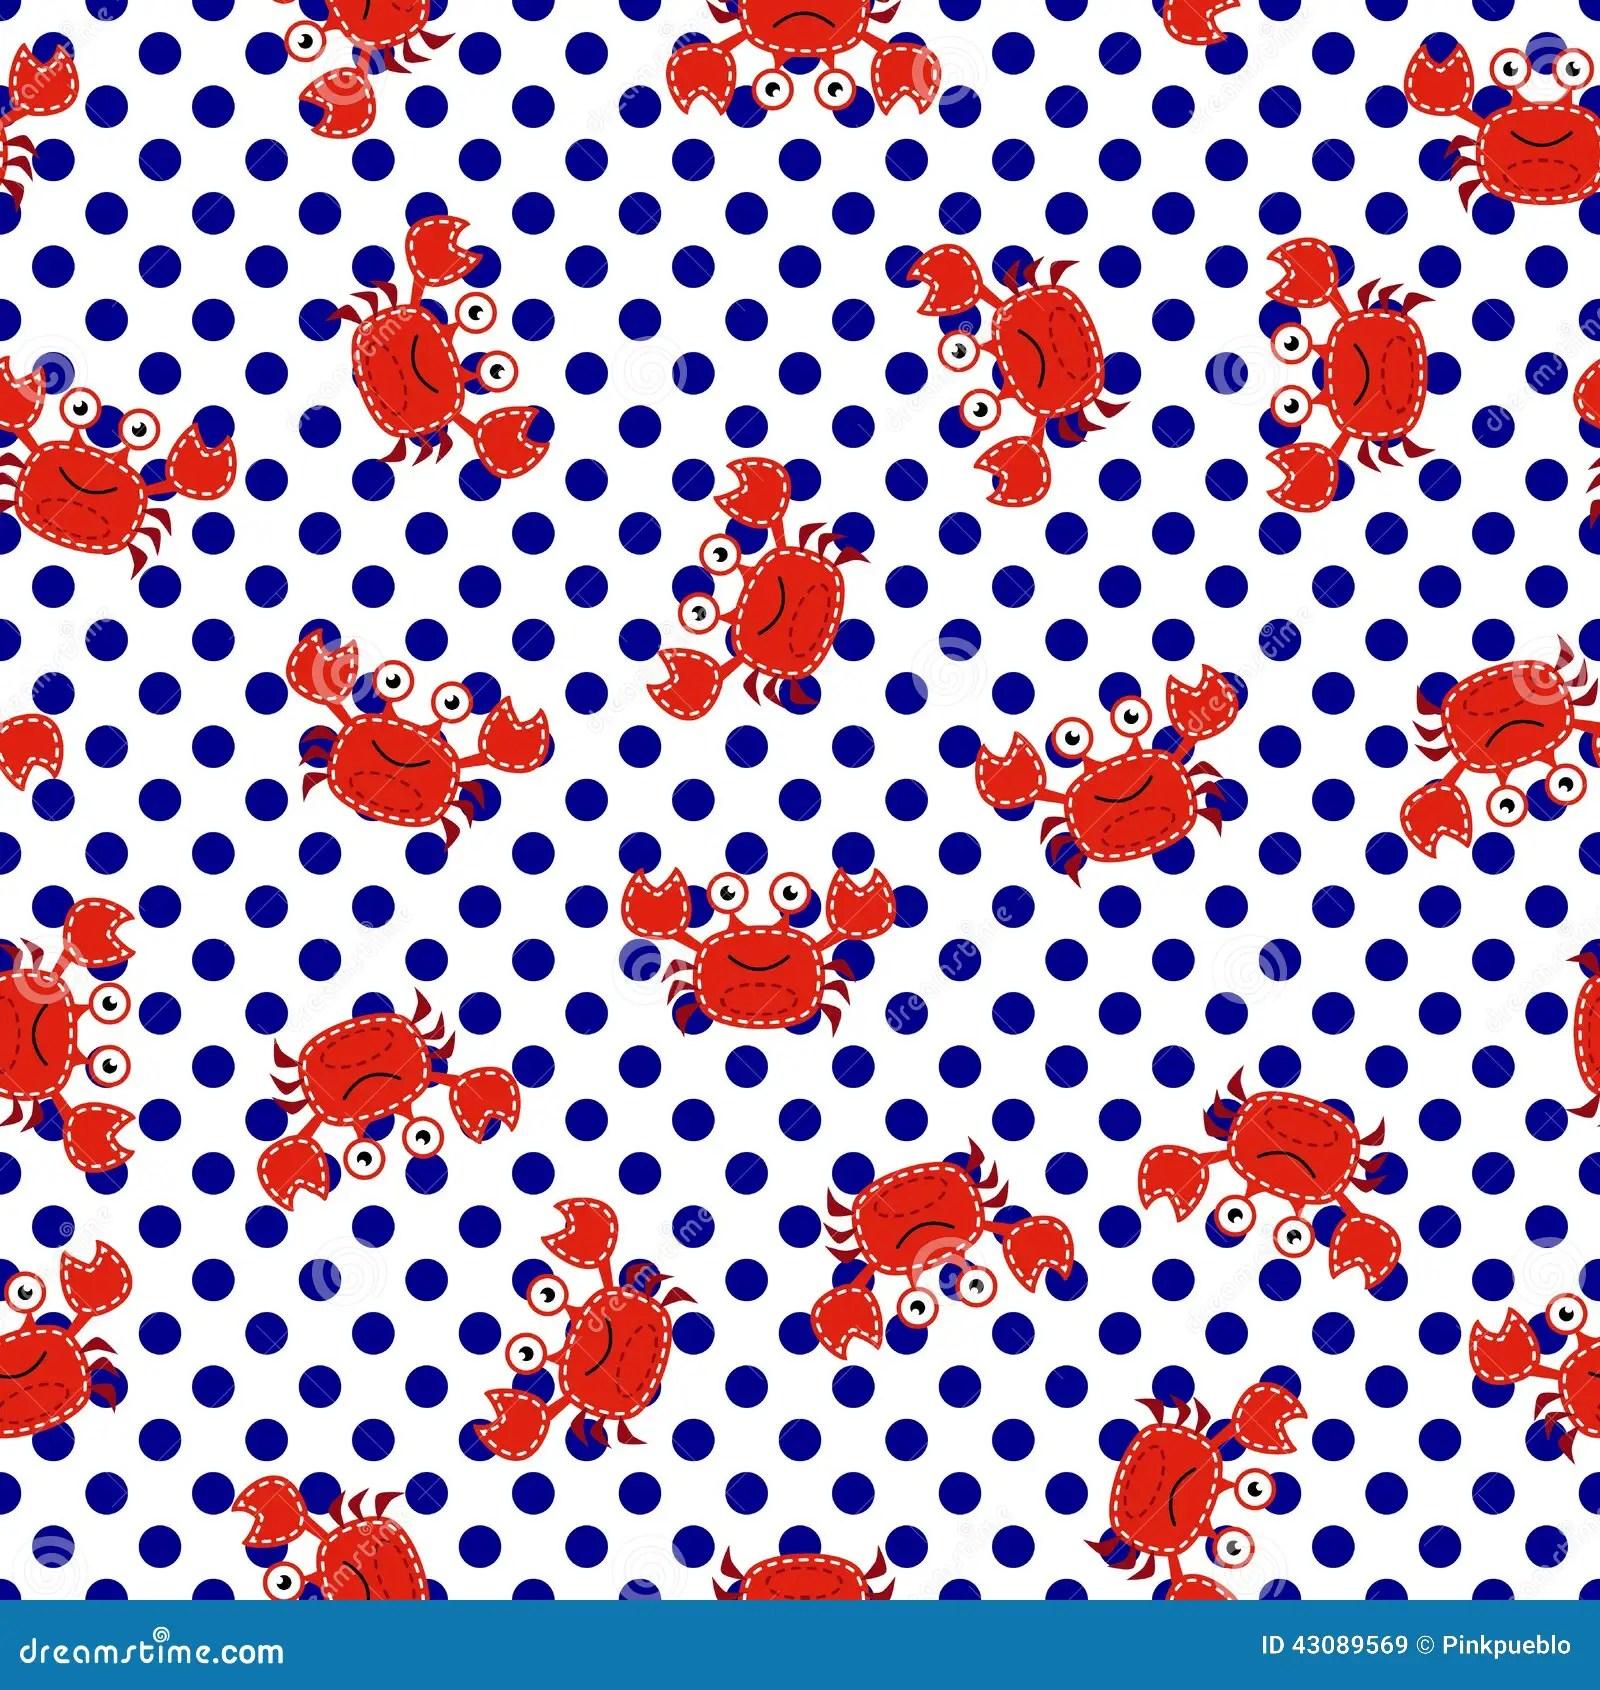 Kate Spade Desktop Wallpaper Fall Seamless Tileable Nautical Themed Vector Background Or